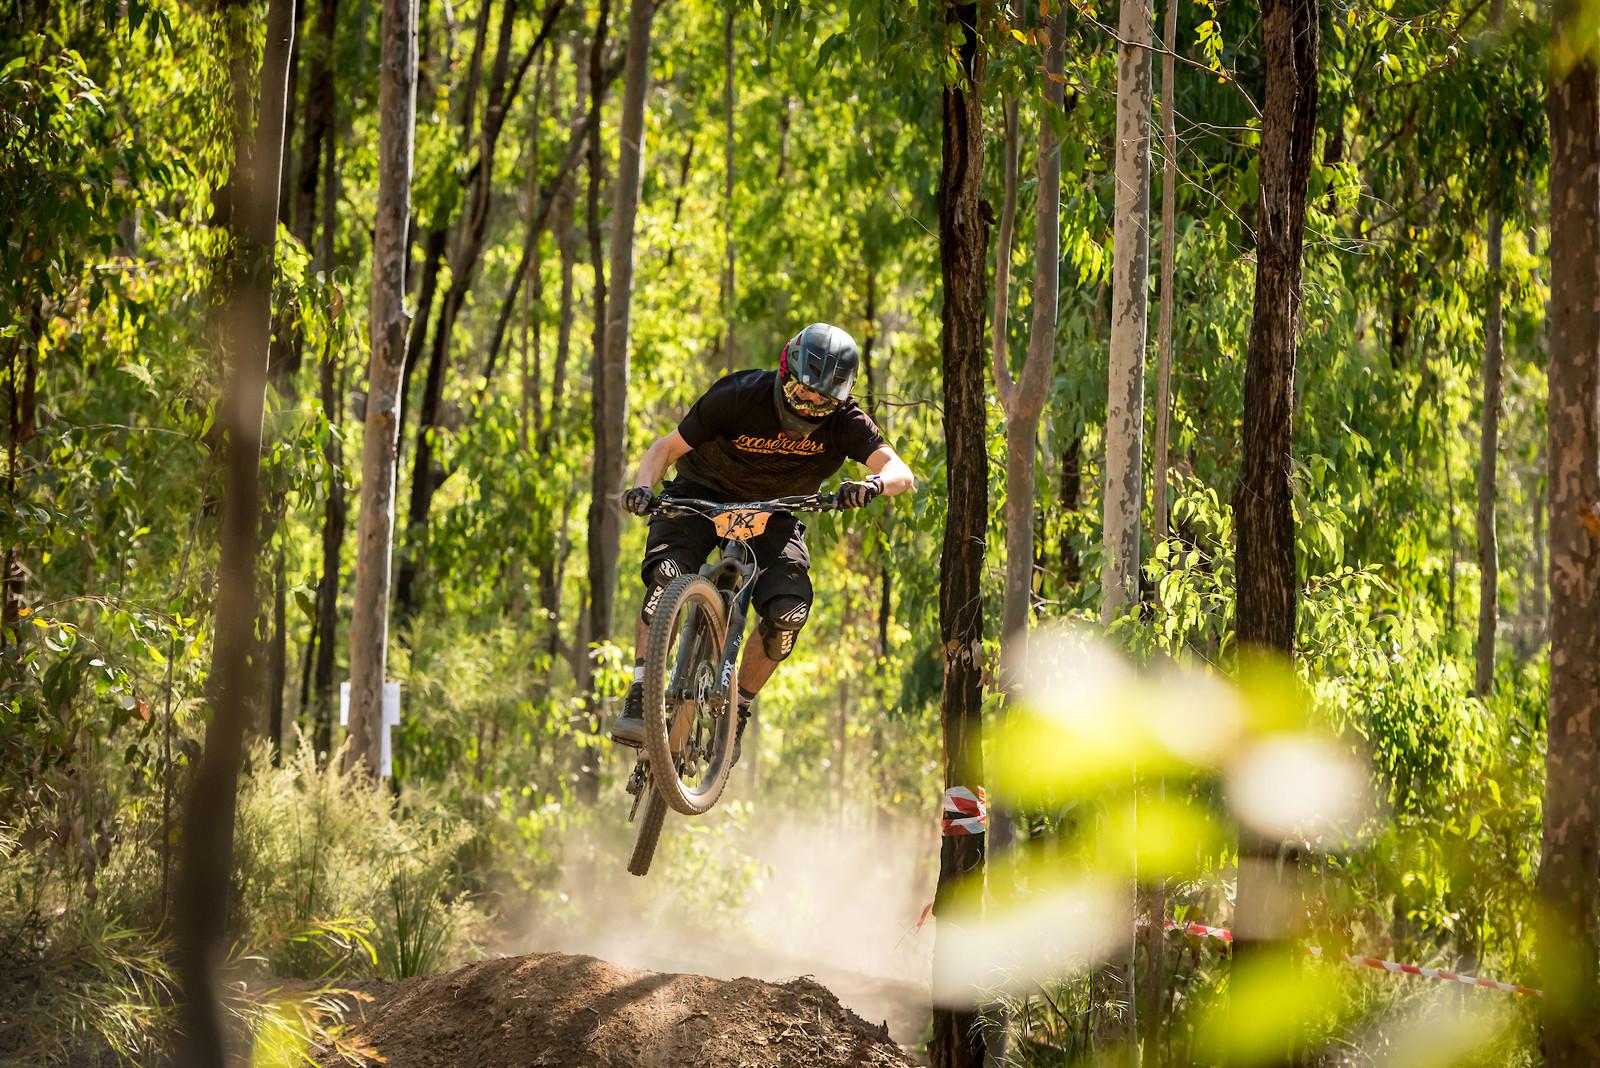 Crusing through the Tamrookum forest - BoostinSimmo - Mountain Biking Pictures - Vital MTB